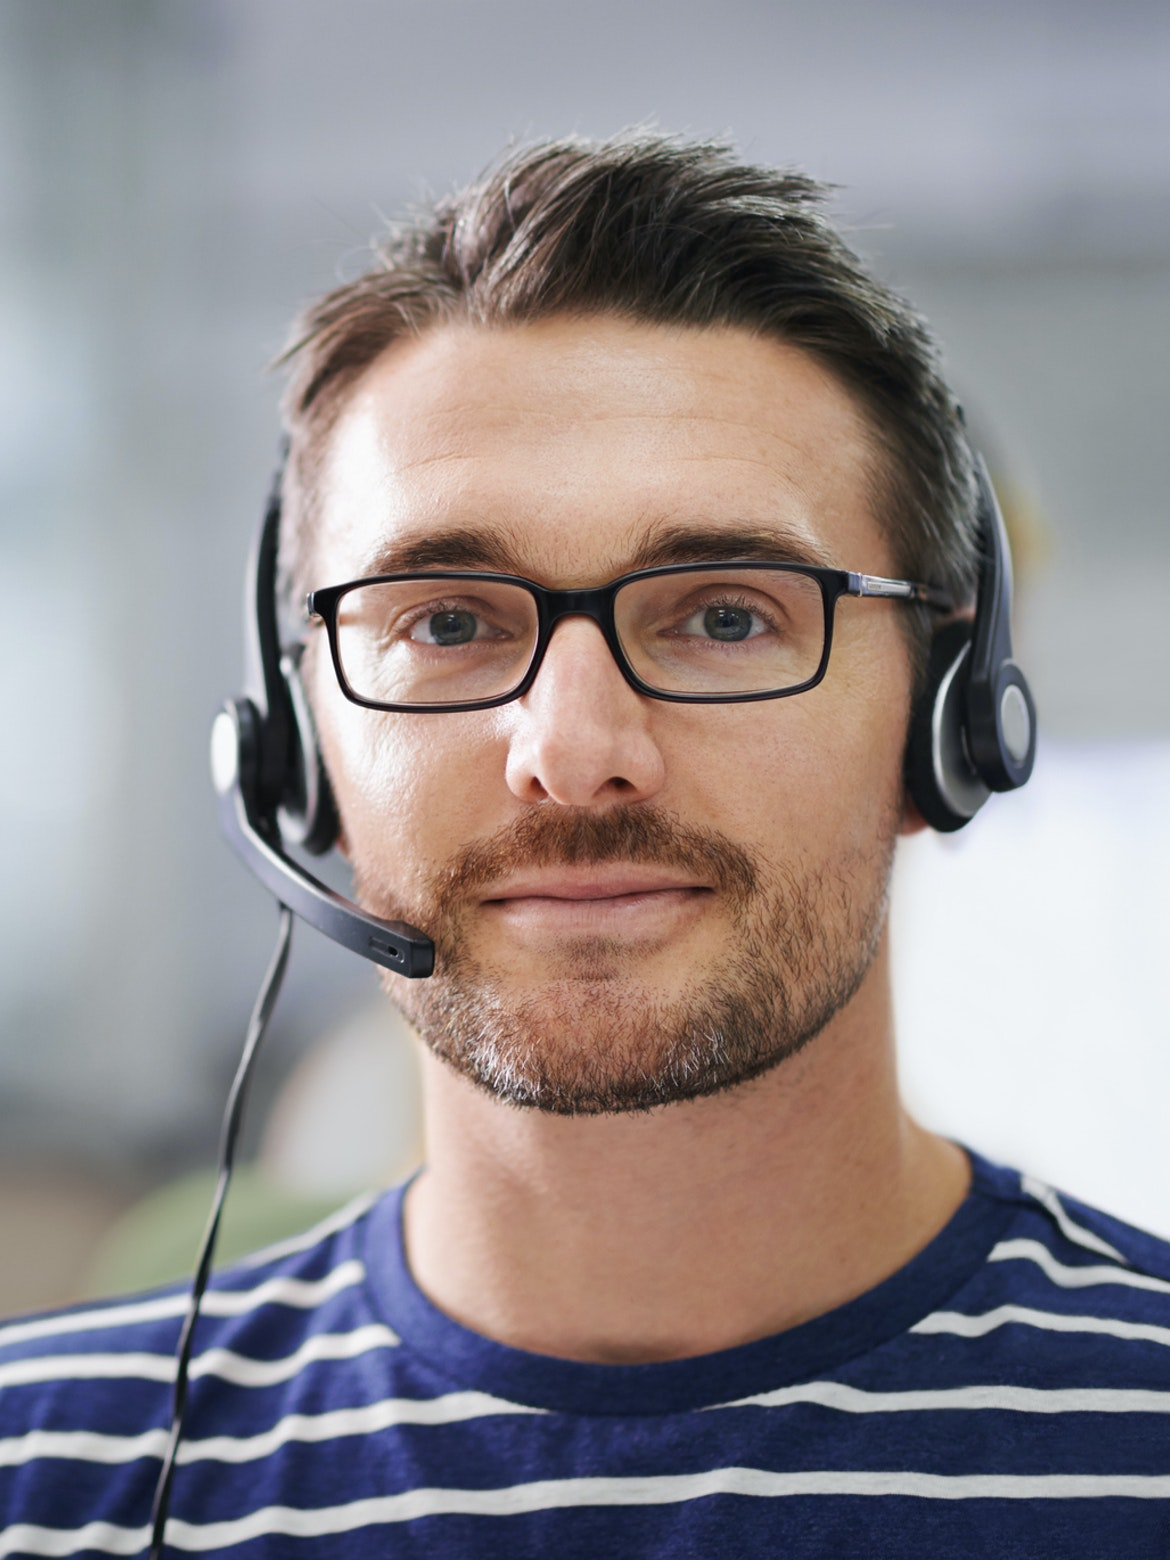 Mann i kundeservice med hodetelefoner ser i kamera